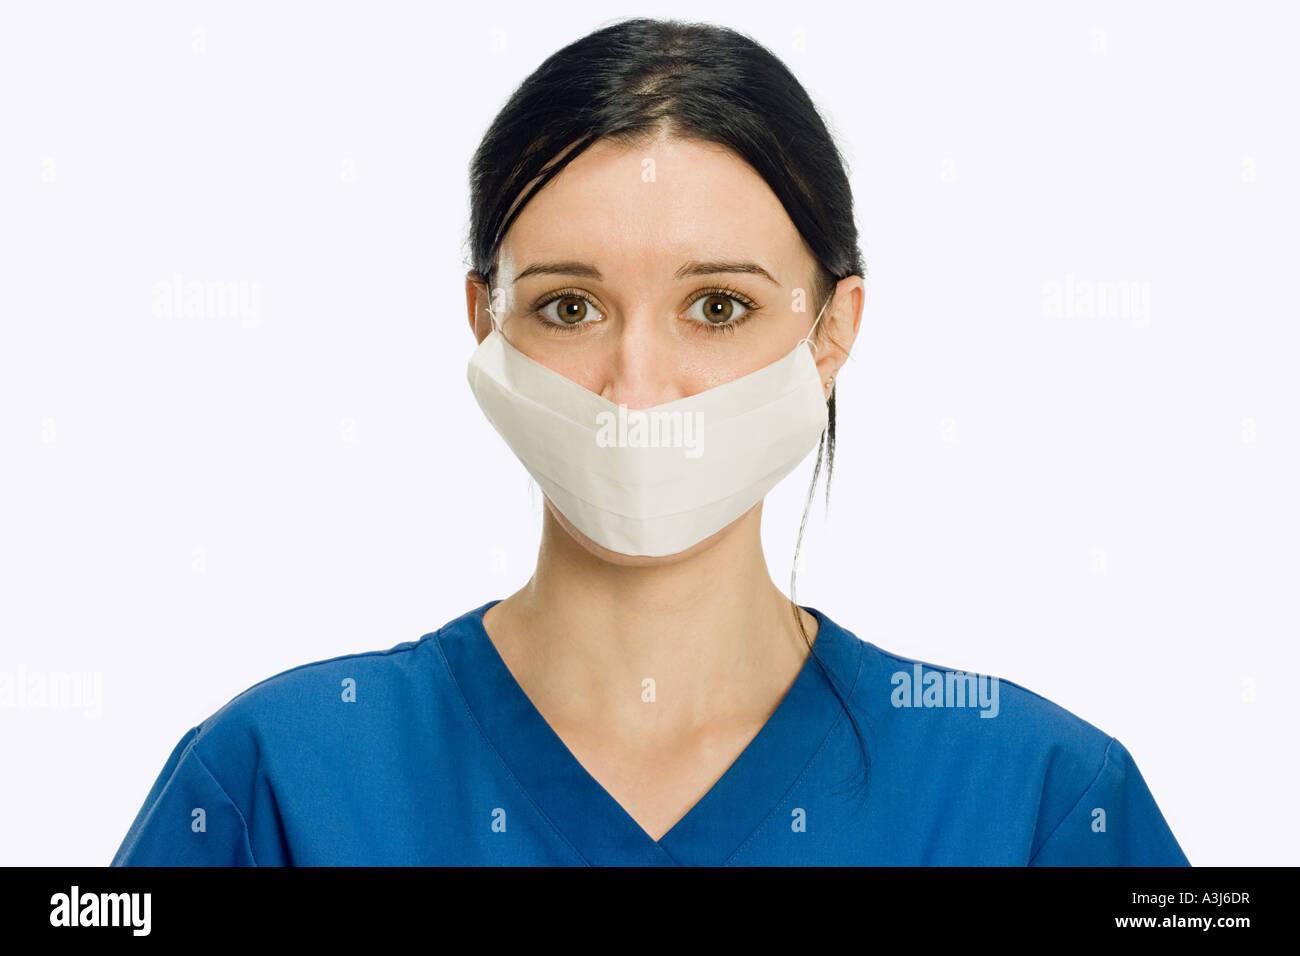 Surgeon wearing surgical mask - Stock Image